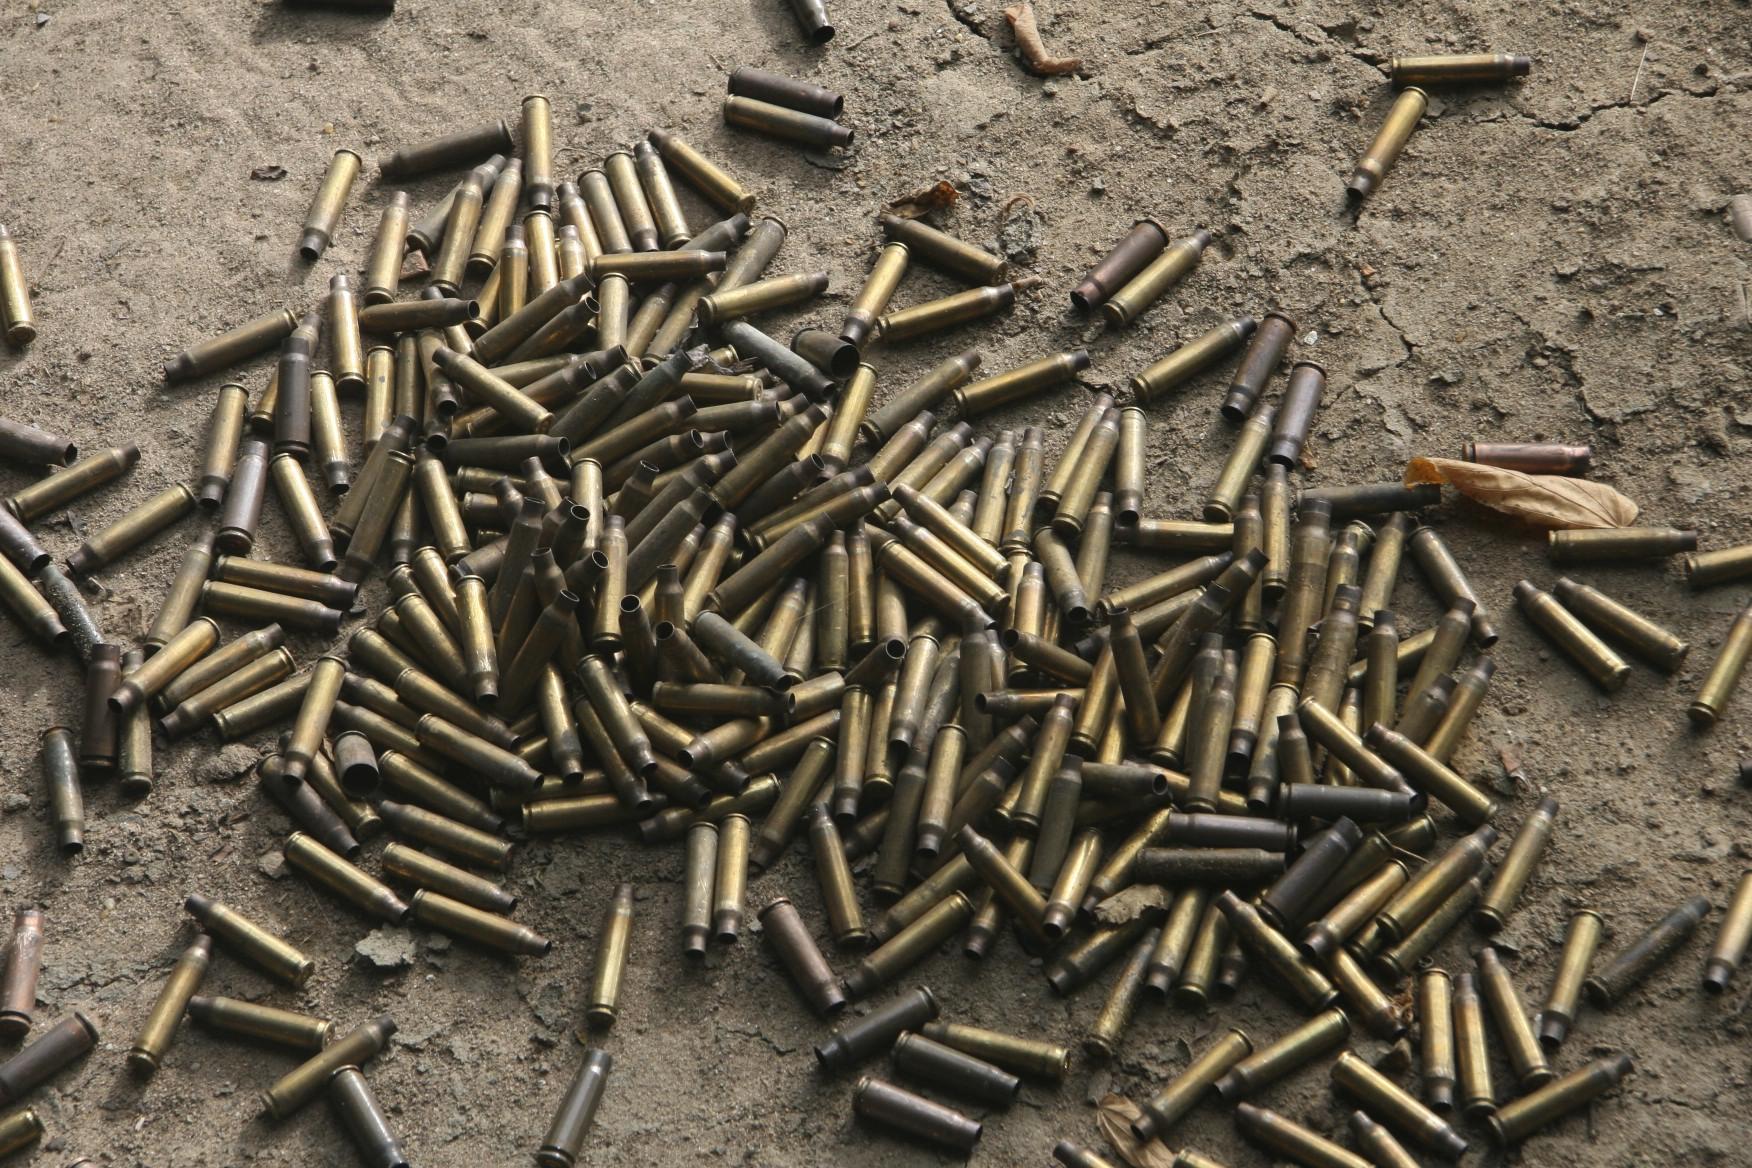 Shells after we shot at a target.